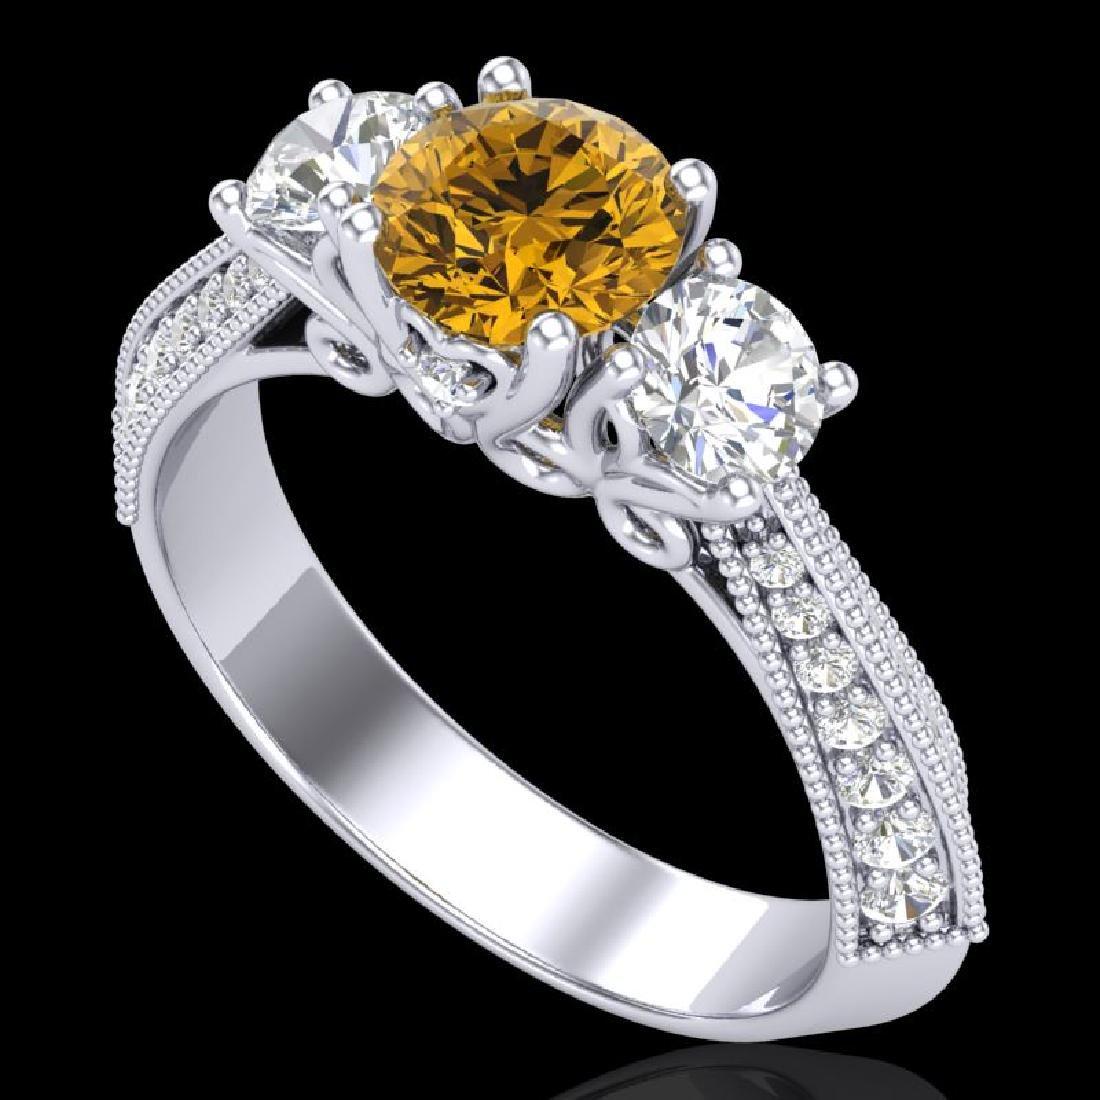 1.81 CTW Intense Fancy Yellow Diamond Art Deco 3 Stone